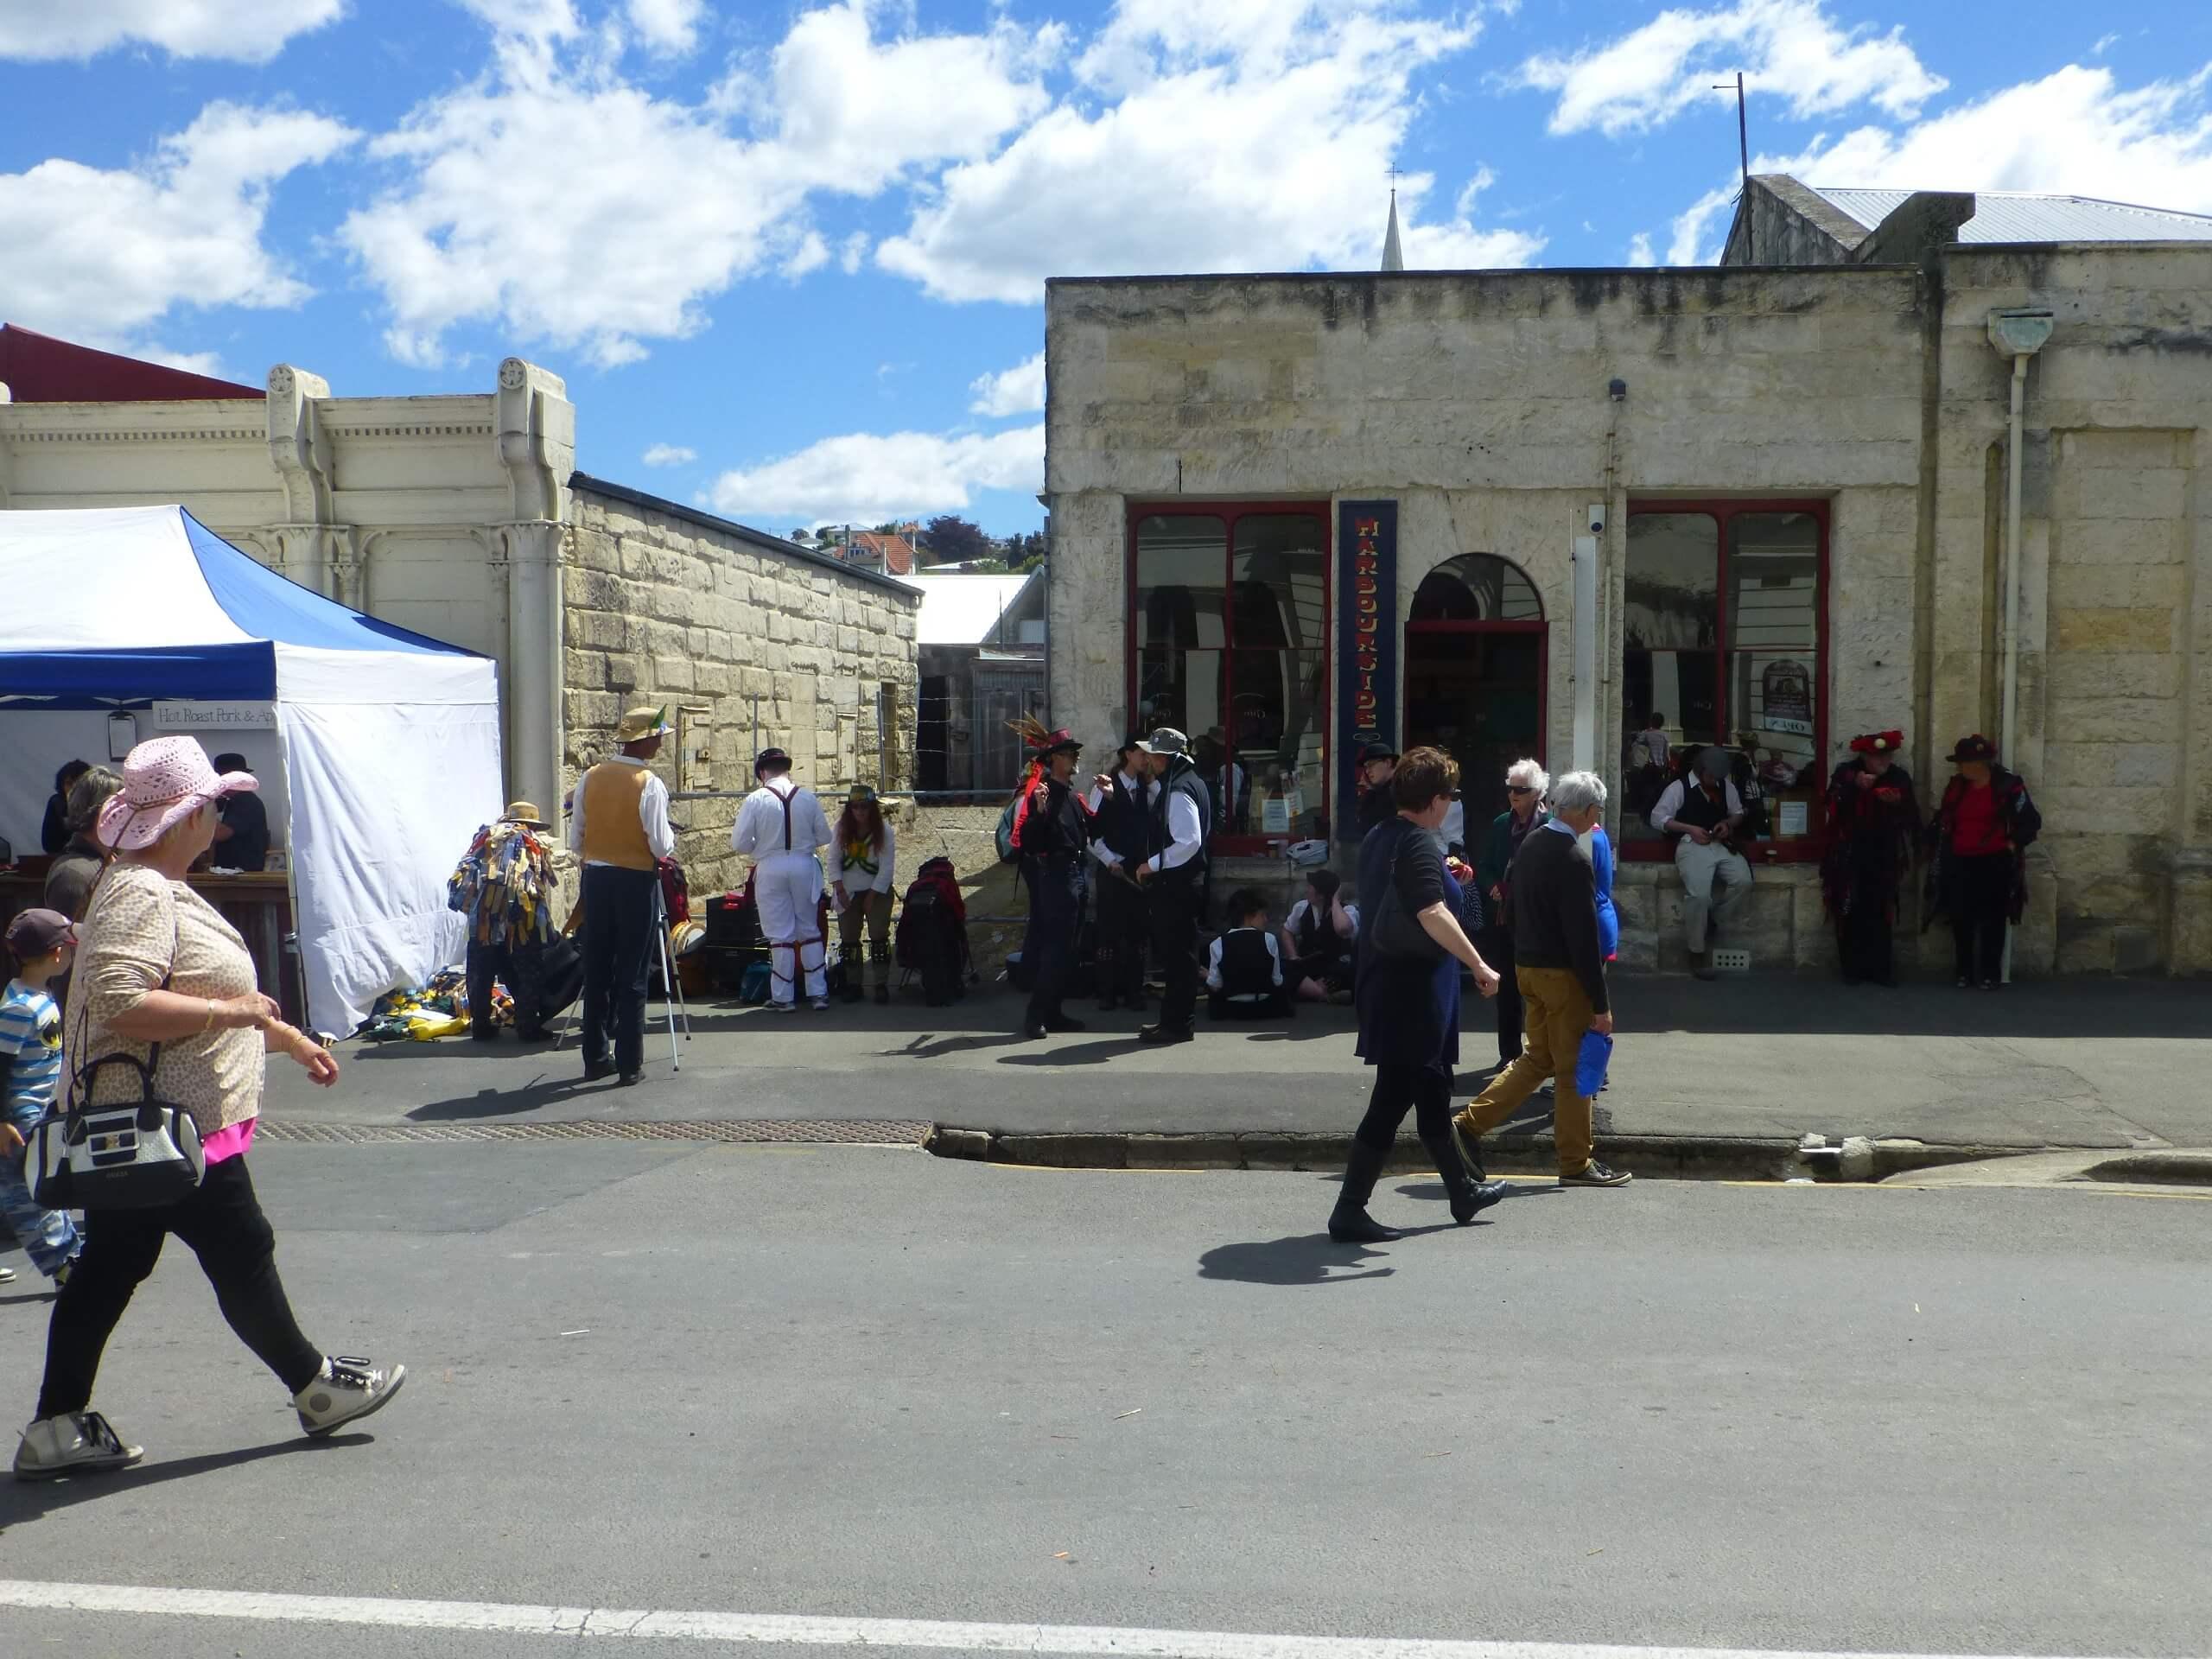 Viktorian Festival in Oamaru 23